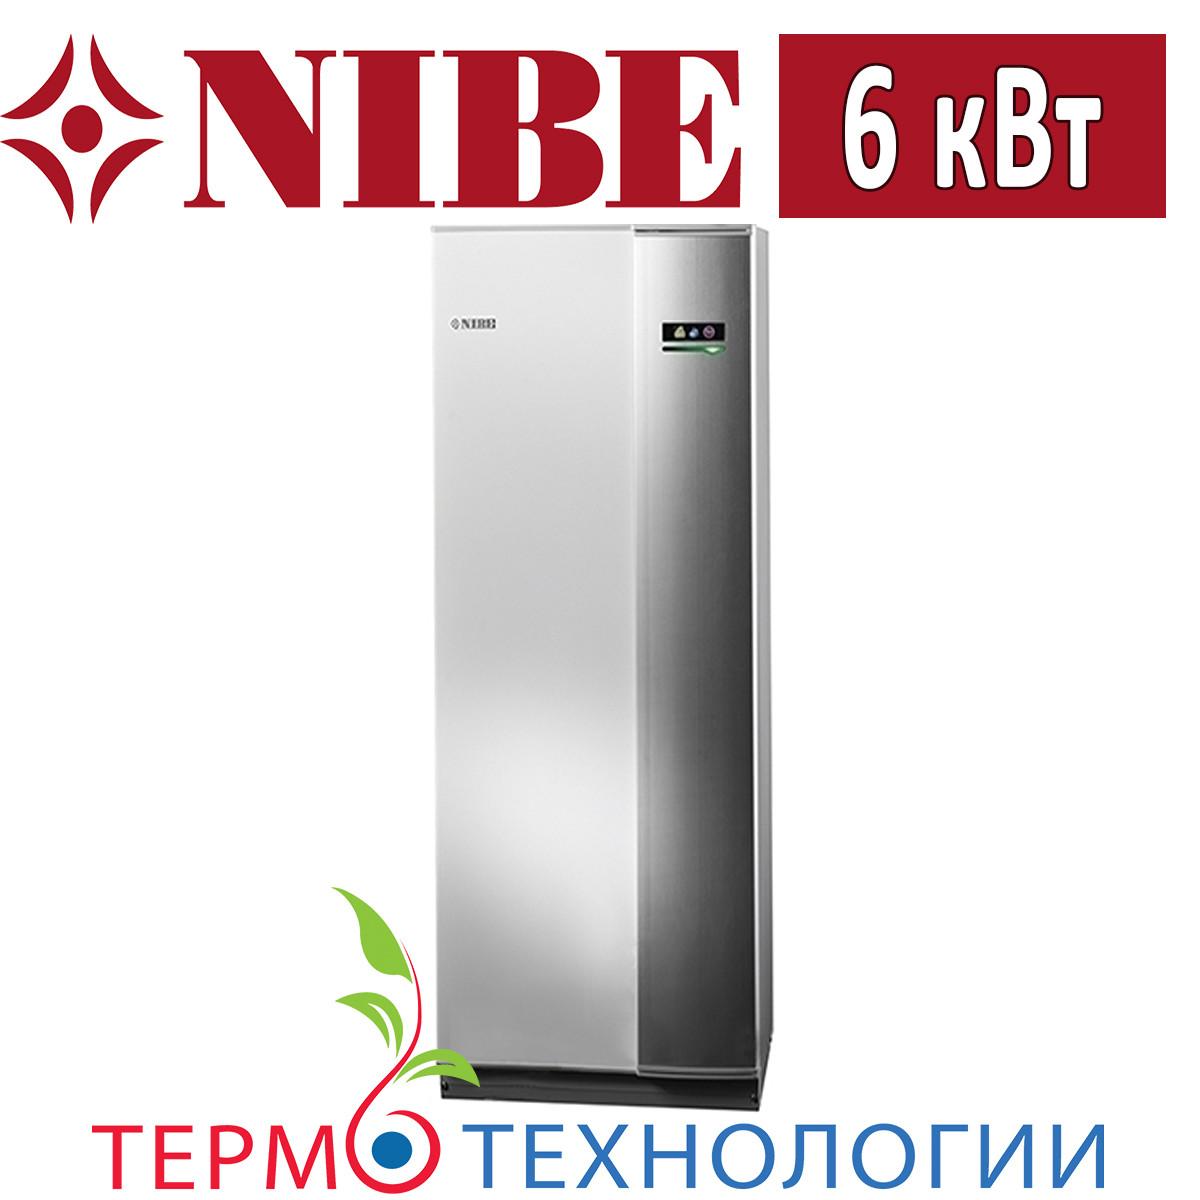 Тепловой насос грунт-вода Nibe F1255 R 6 кВт